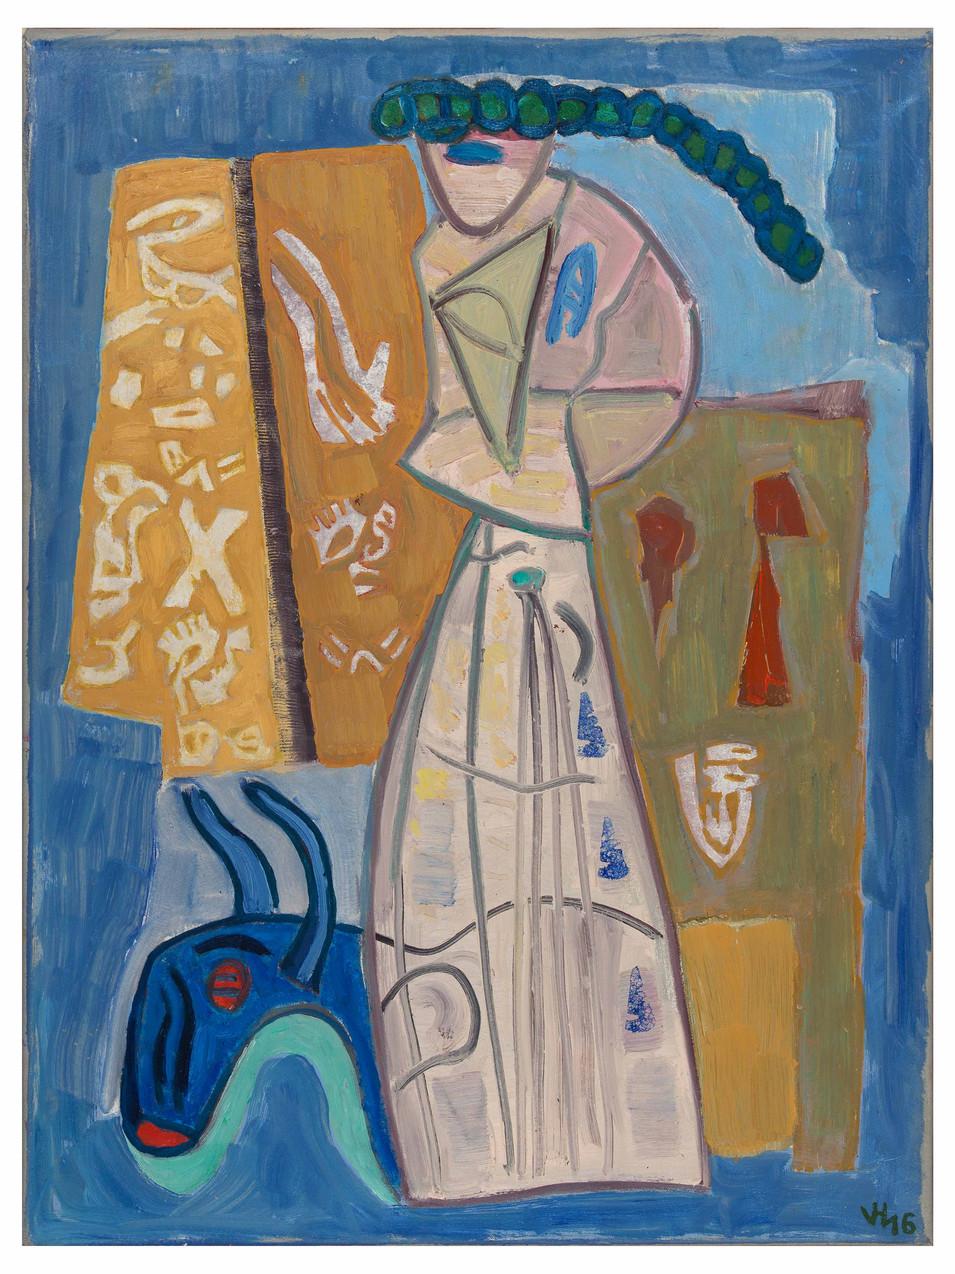 Veit Hofmann | Zauberkünstler | 2016 | Öl auf Leinwand | gerahmt | 80 x 60 cm | 3400 Euro